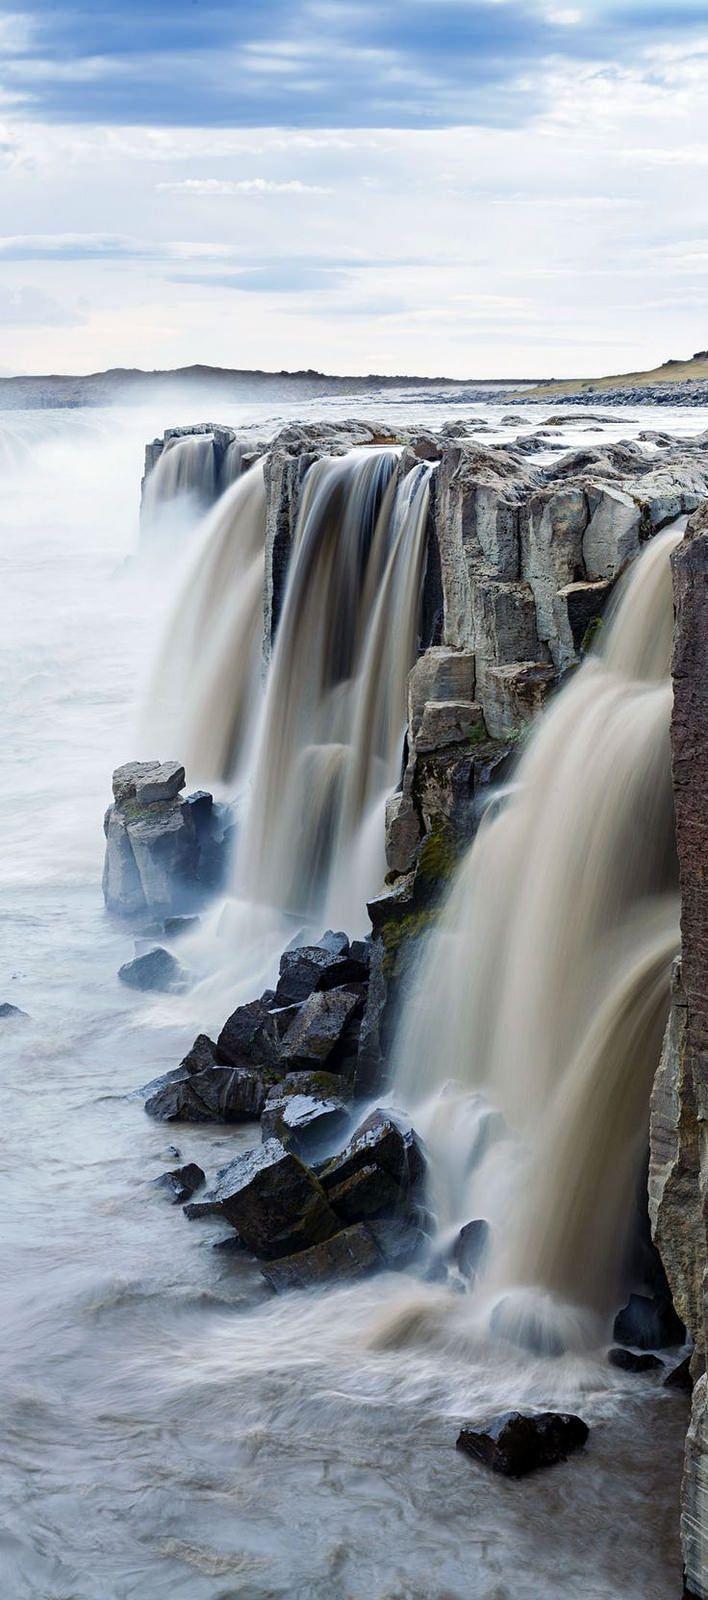 Enjoy Iceland with us.is Nature - Selfoss Waterfall in Jokulsargljufur  National Park Iceland. - by Tom li